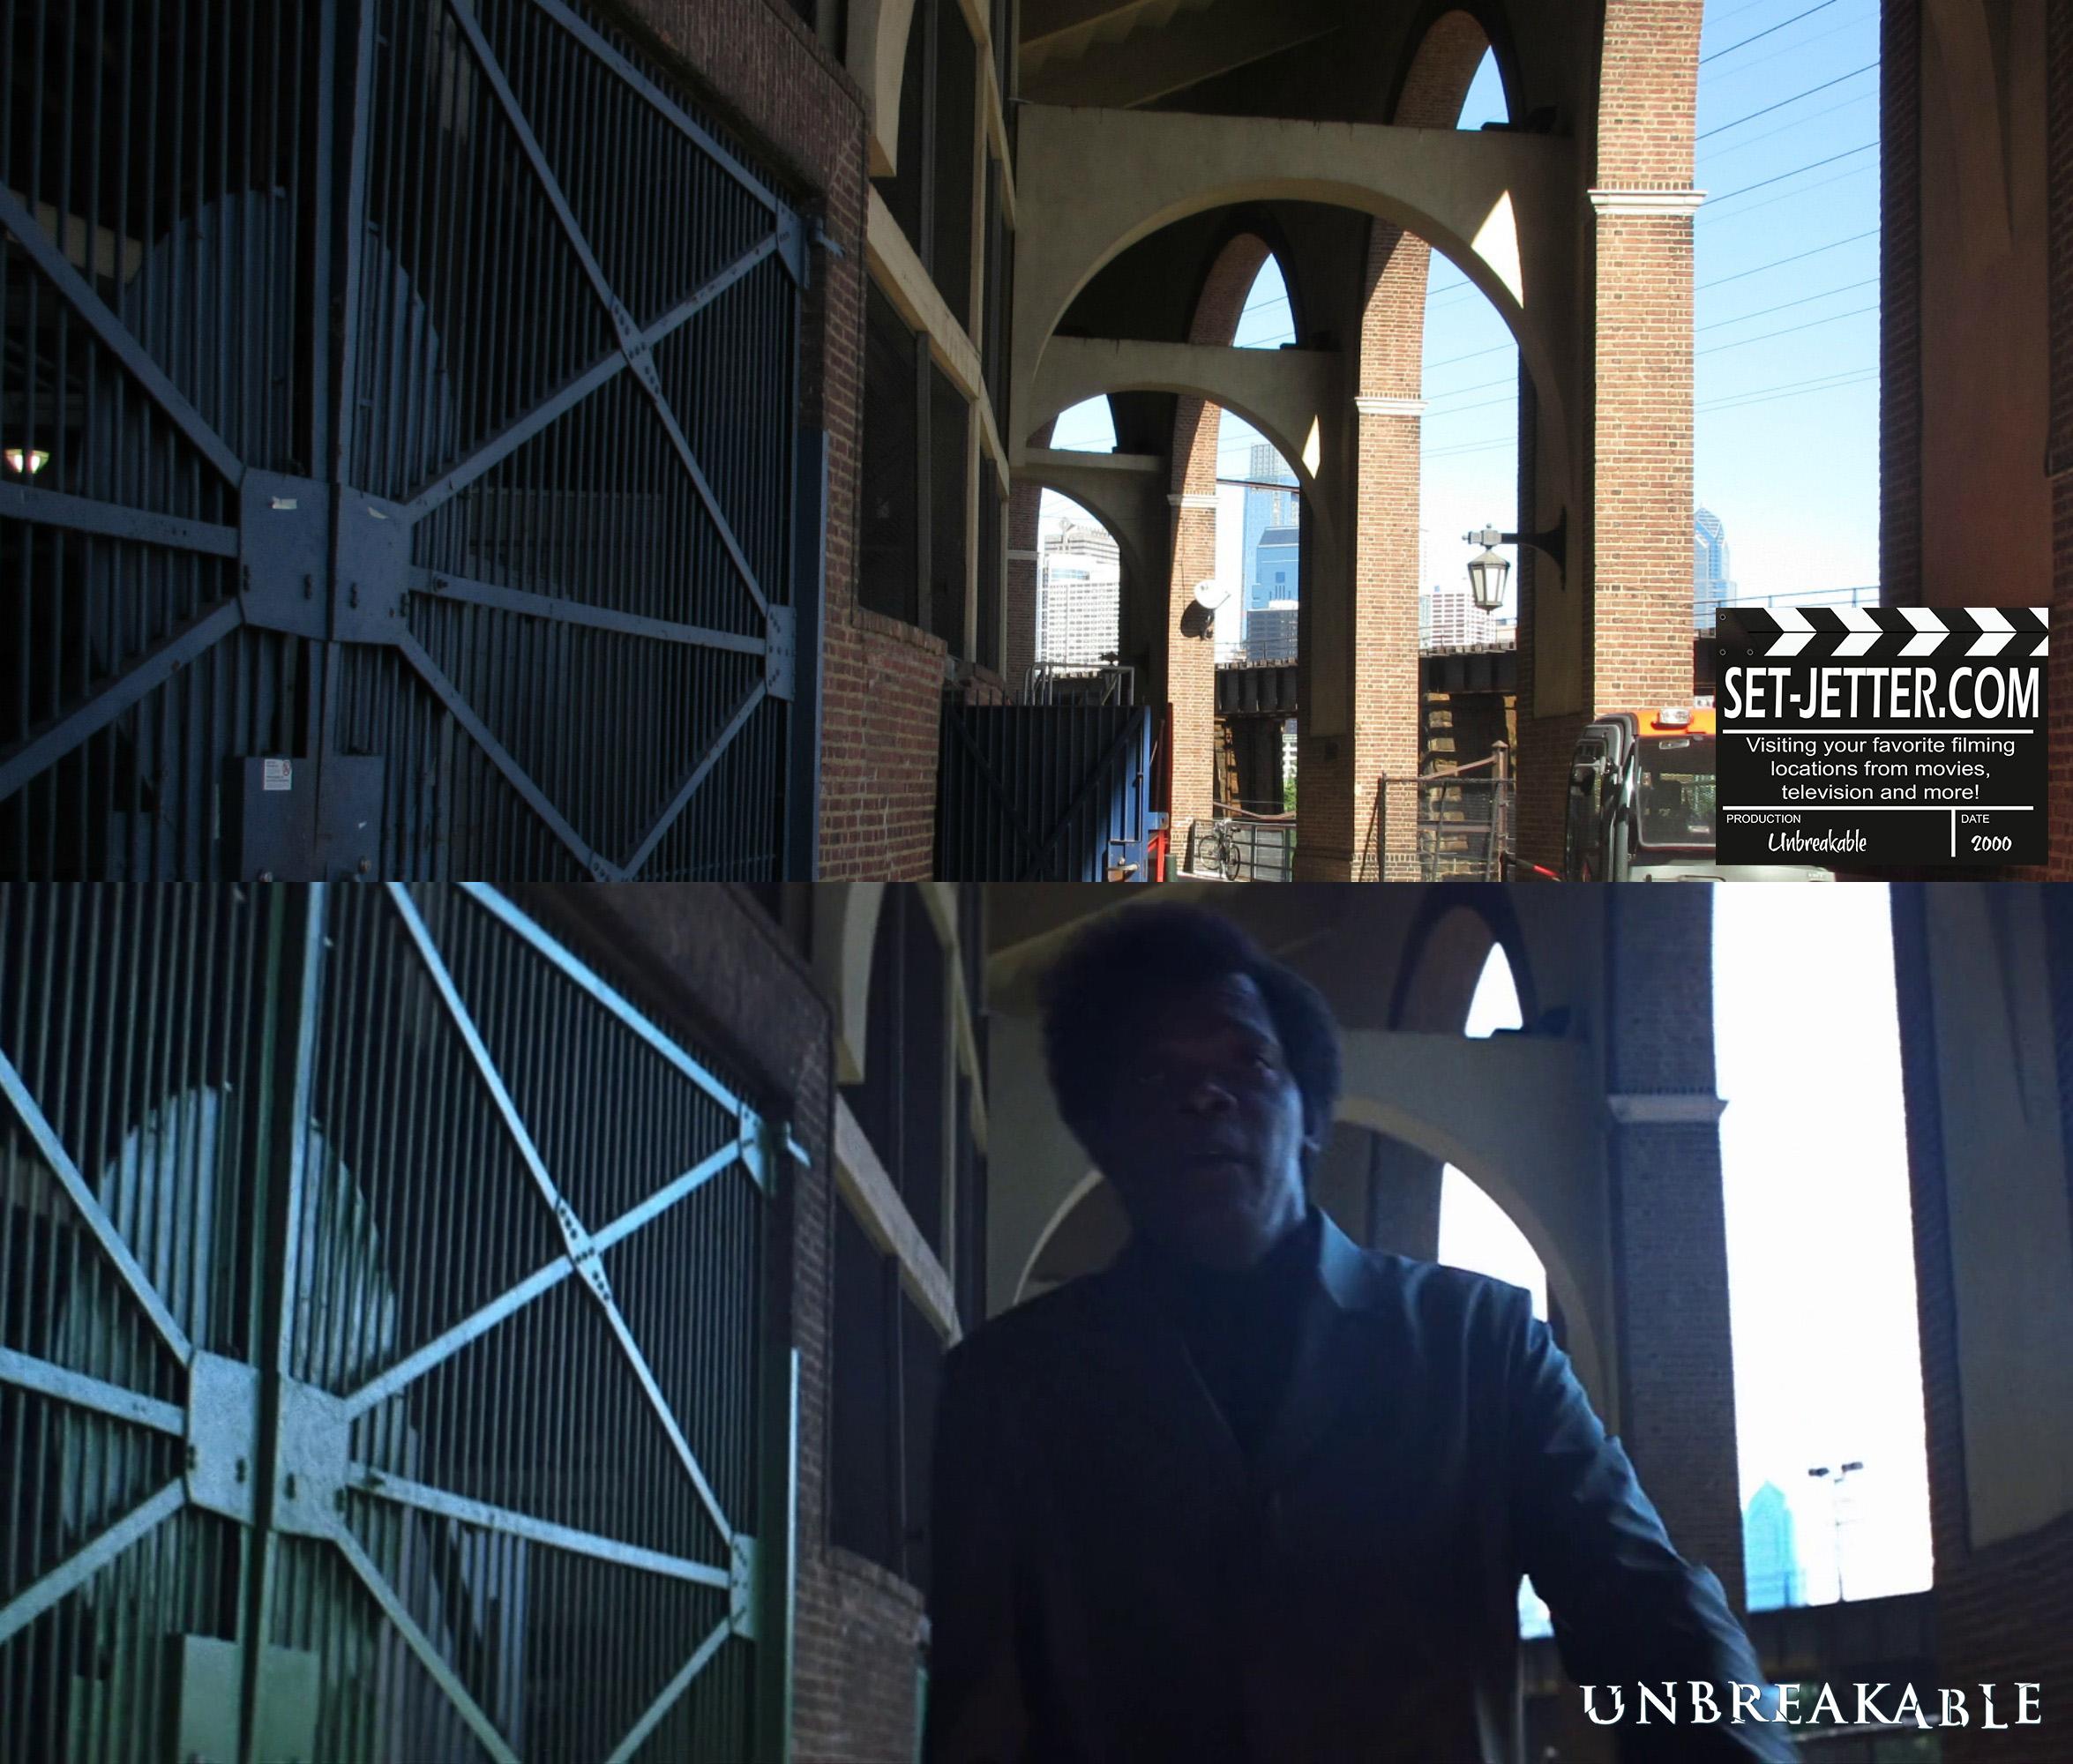 Unbreakable 053.jpg